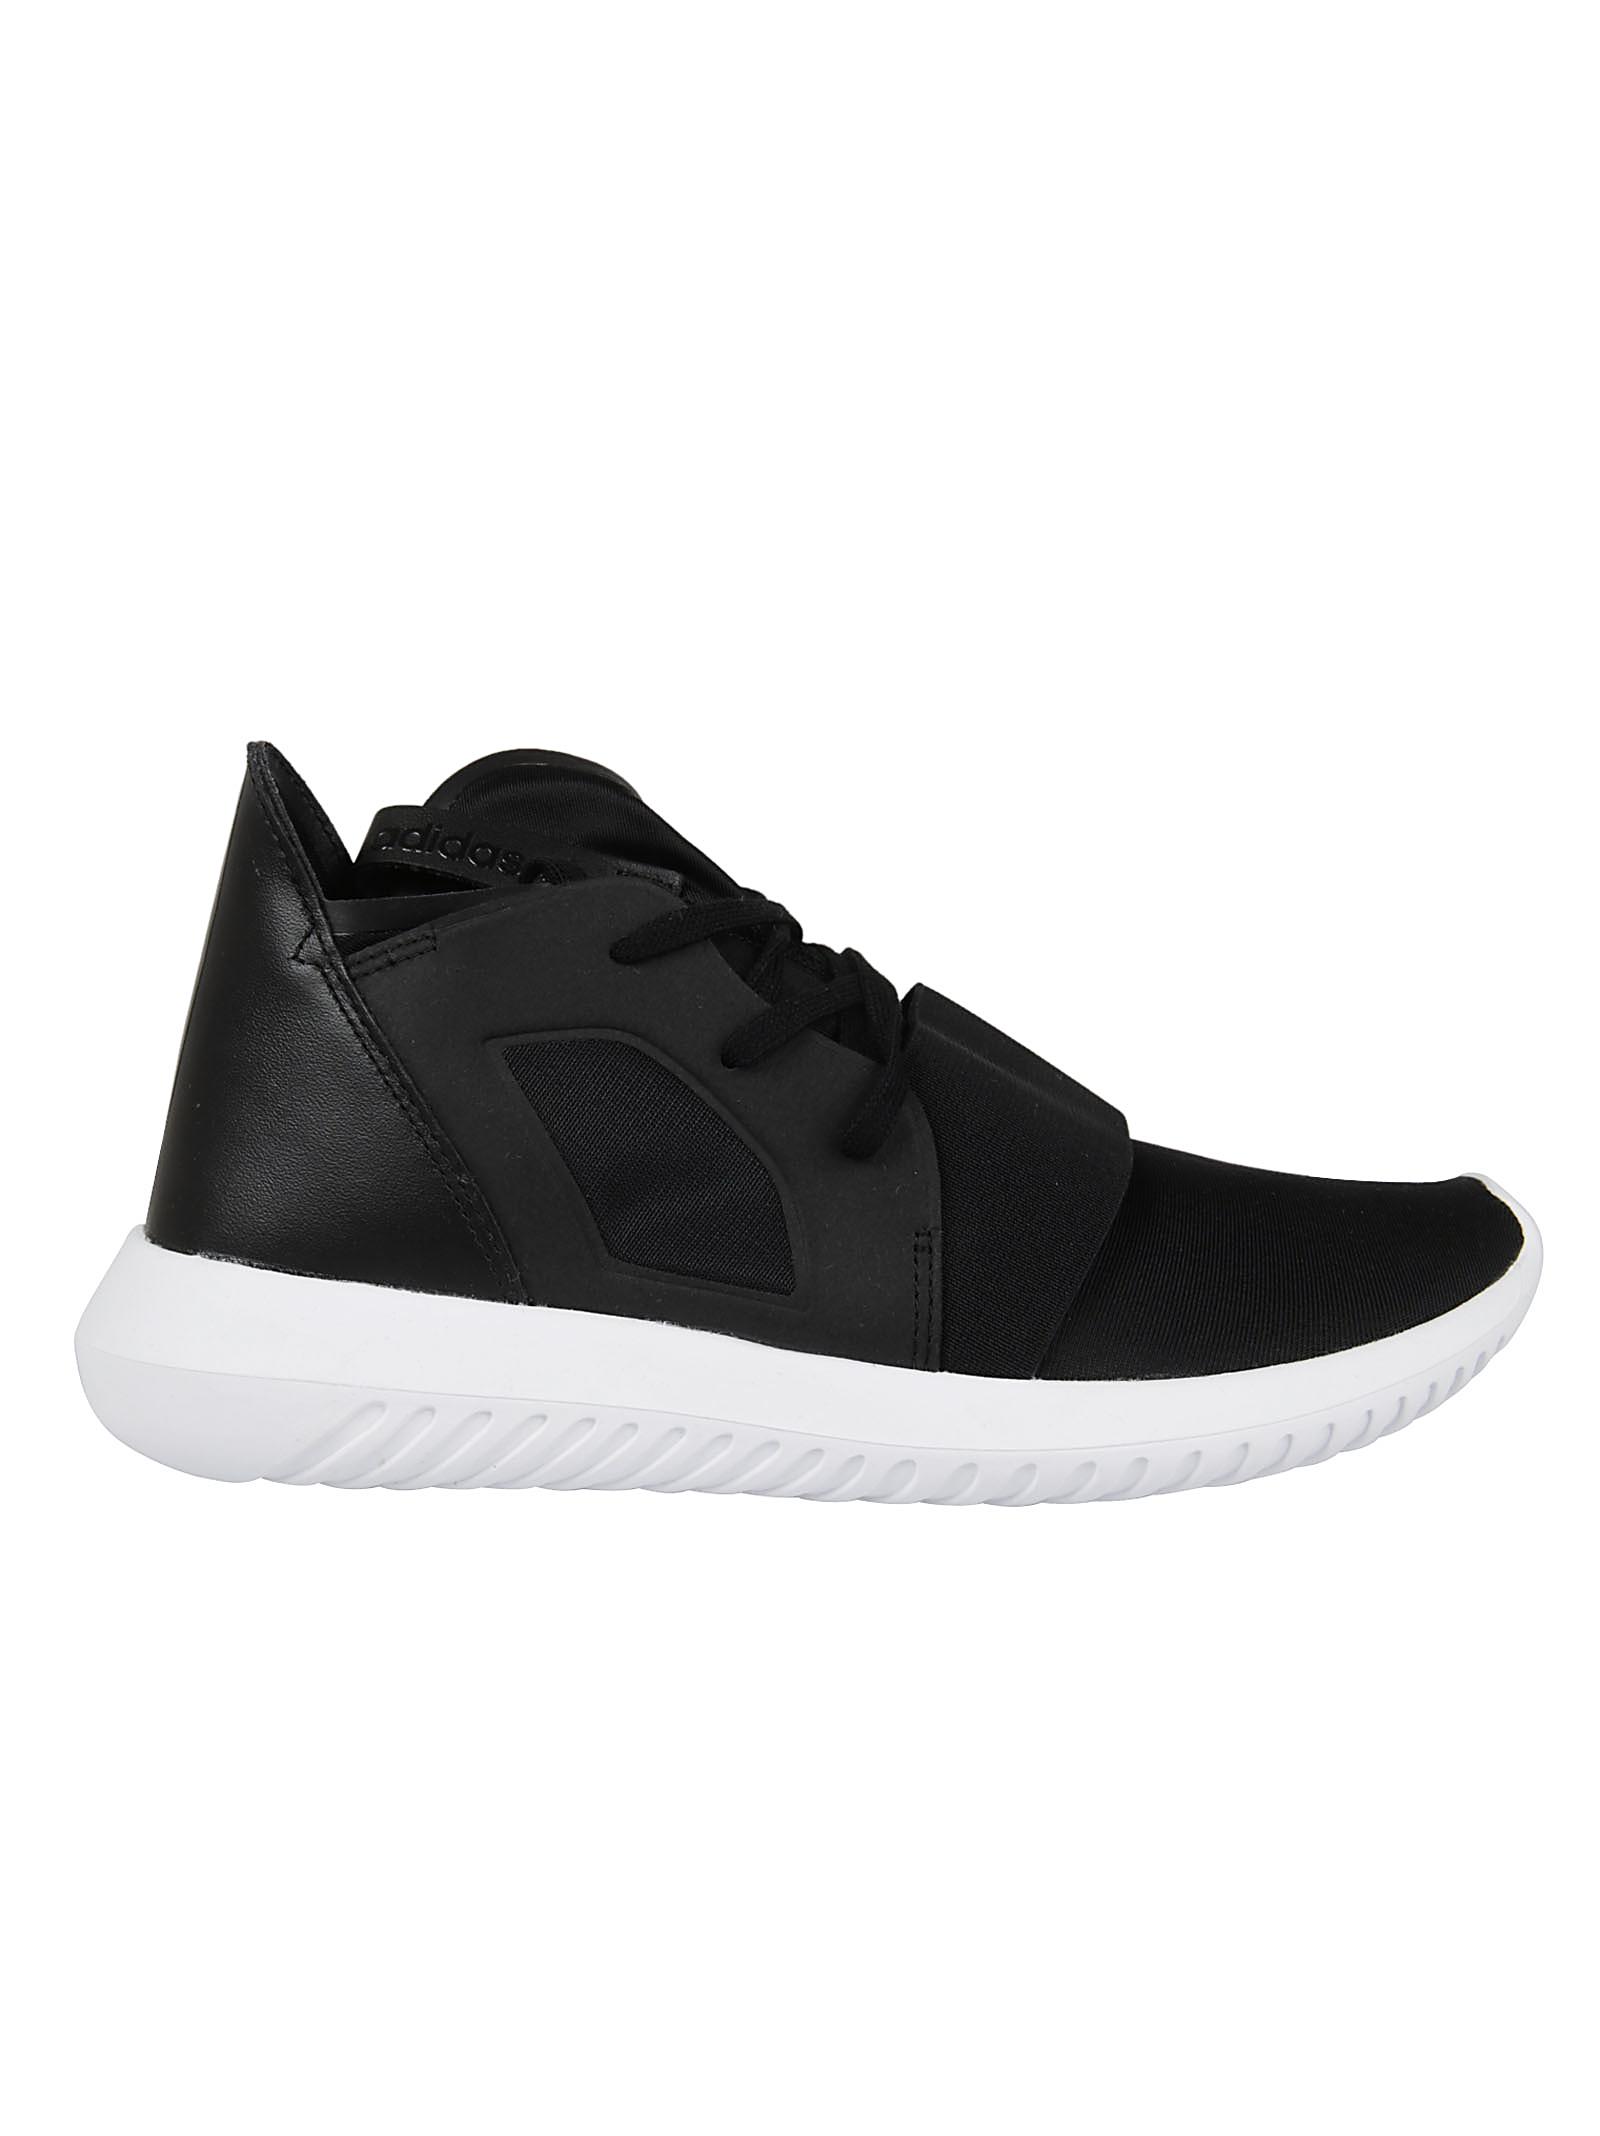 Adidas Adidas Tubular Defiant Sneakers